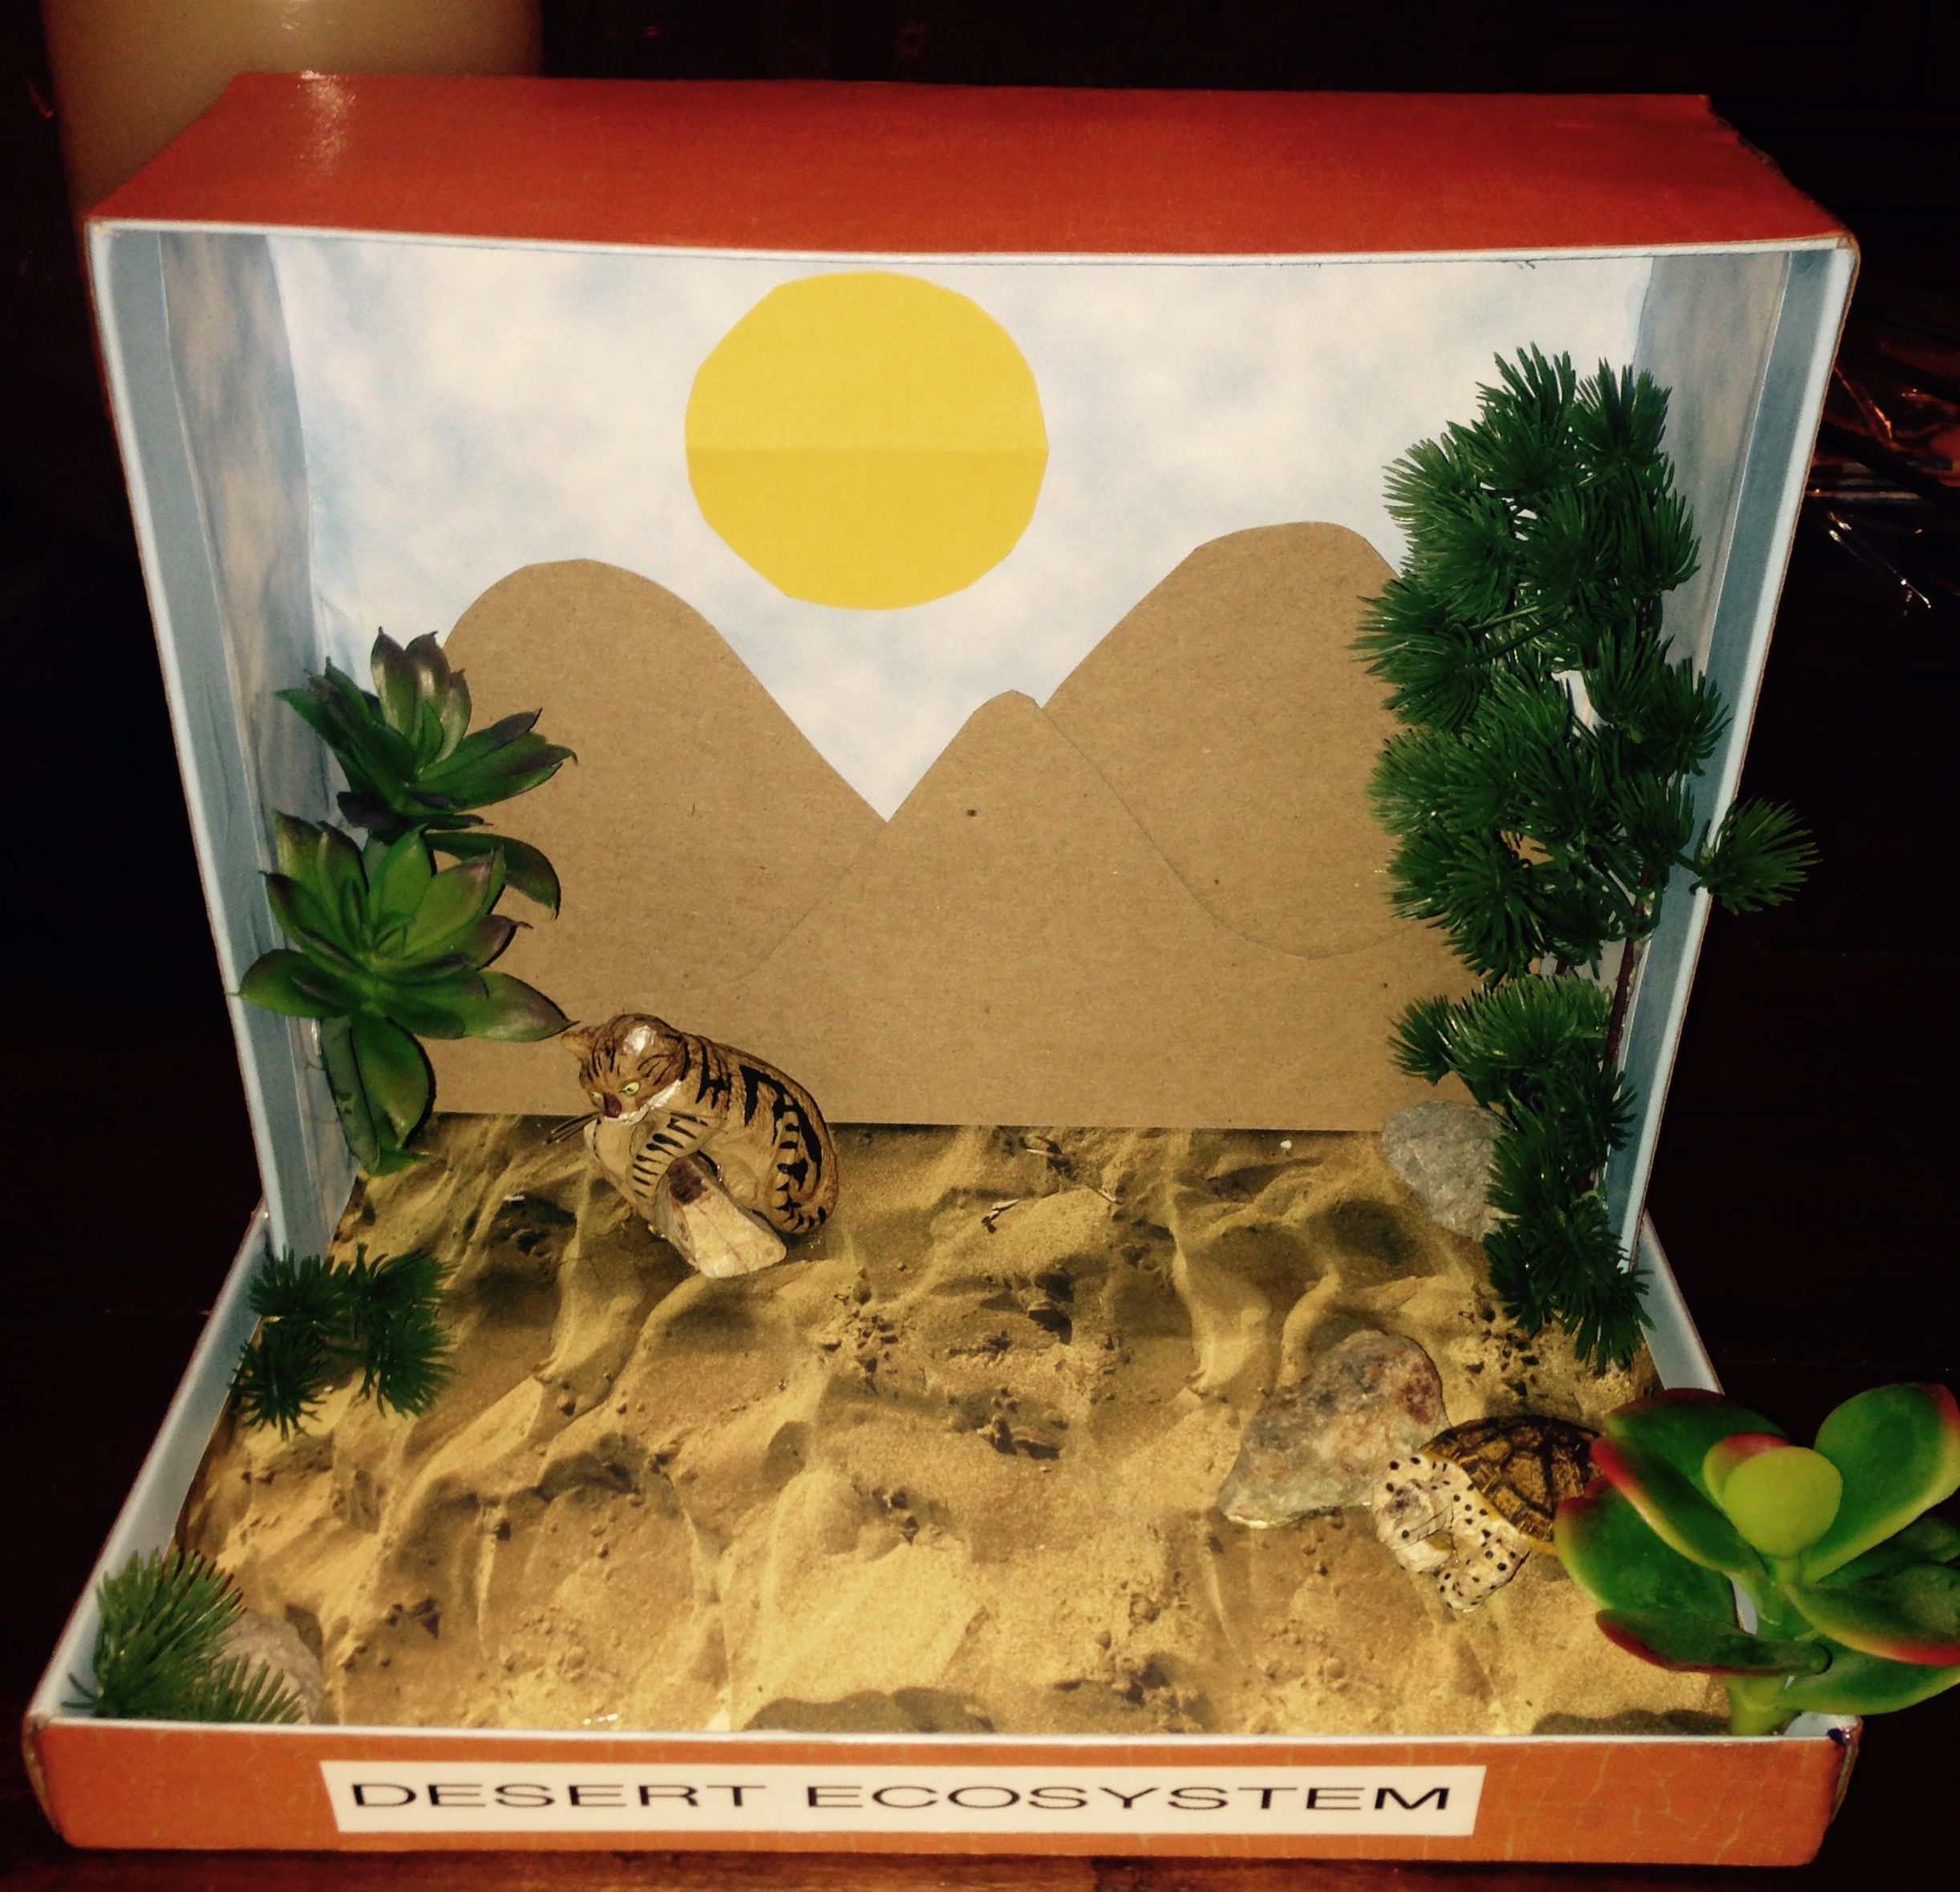 Desert Ecosystem Shoe Box